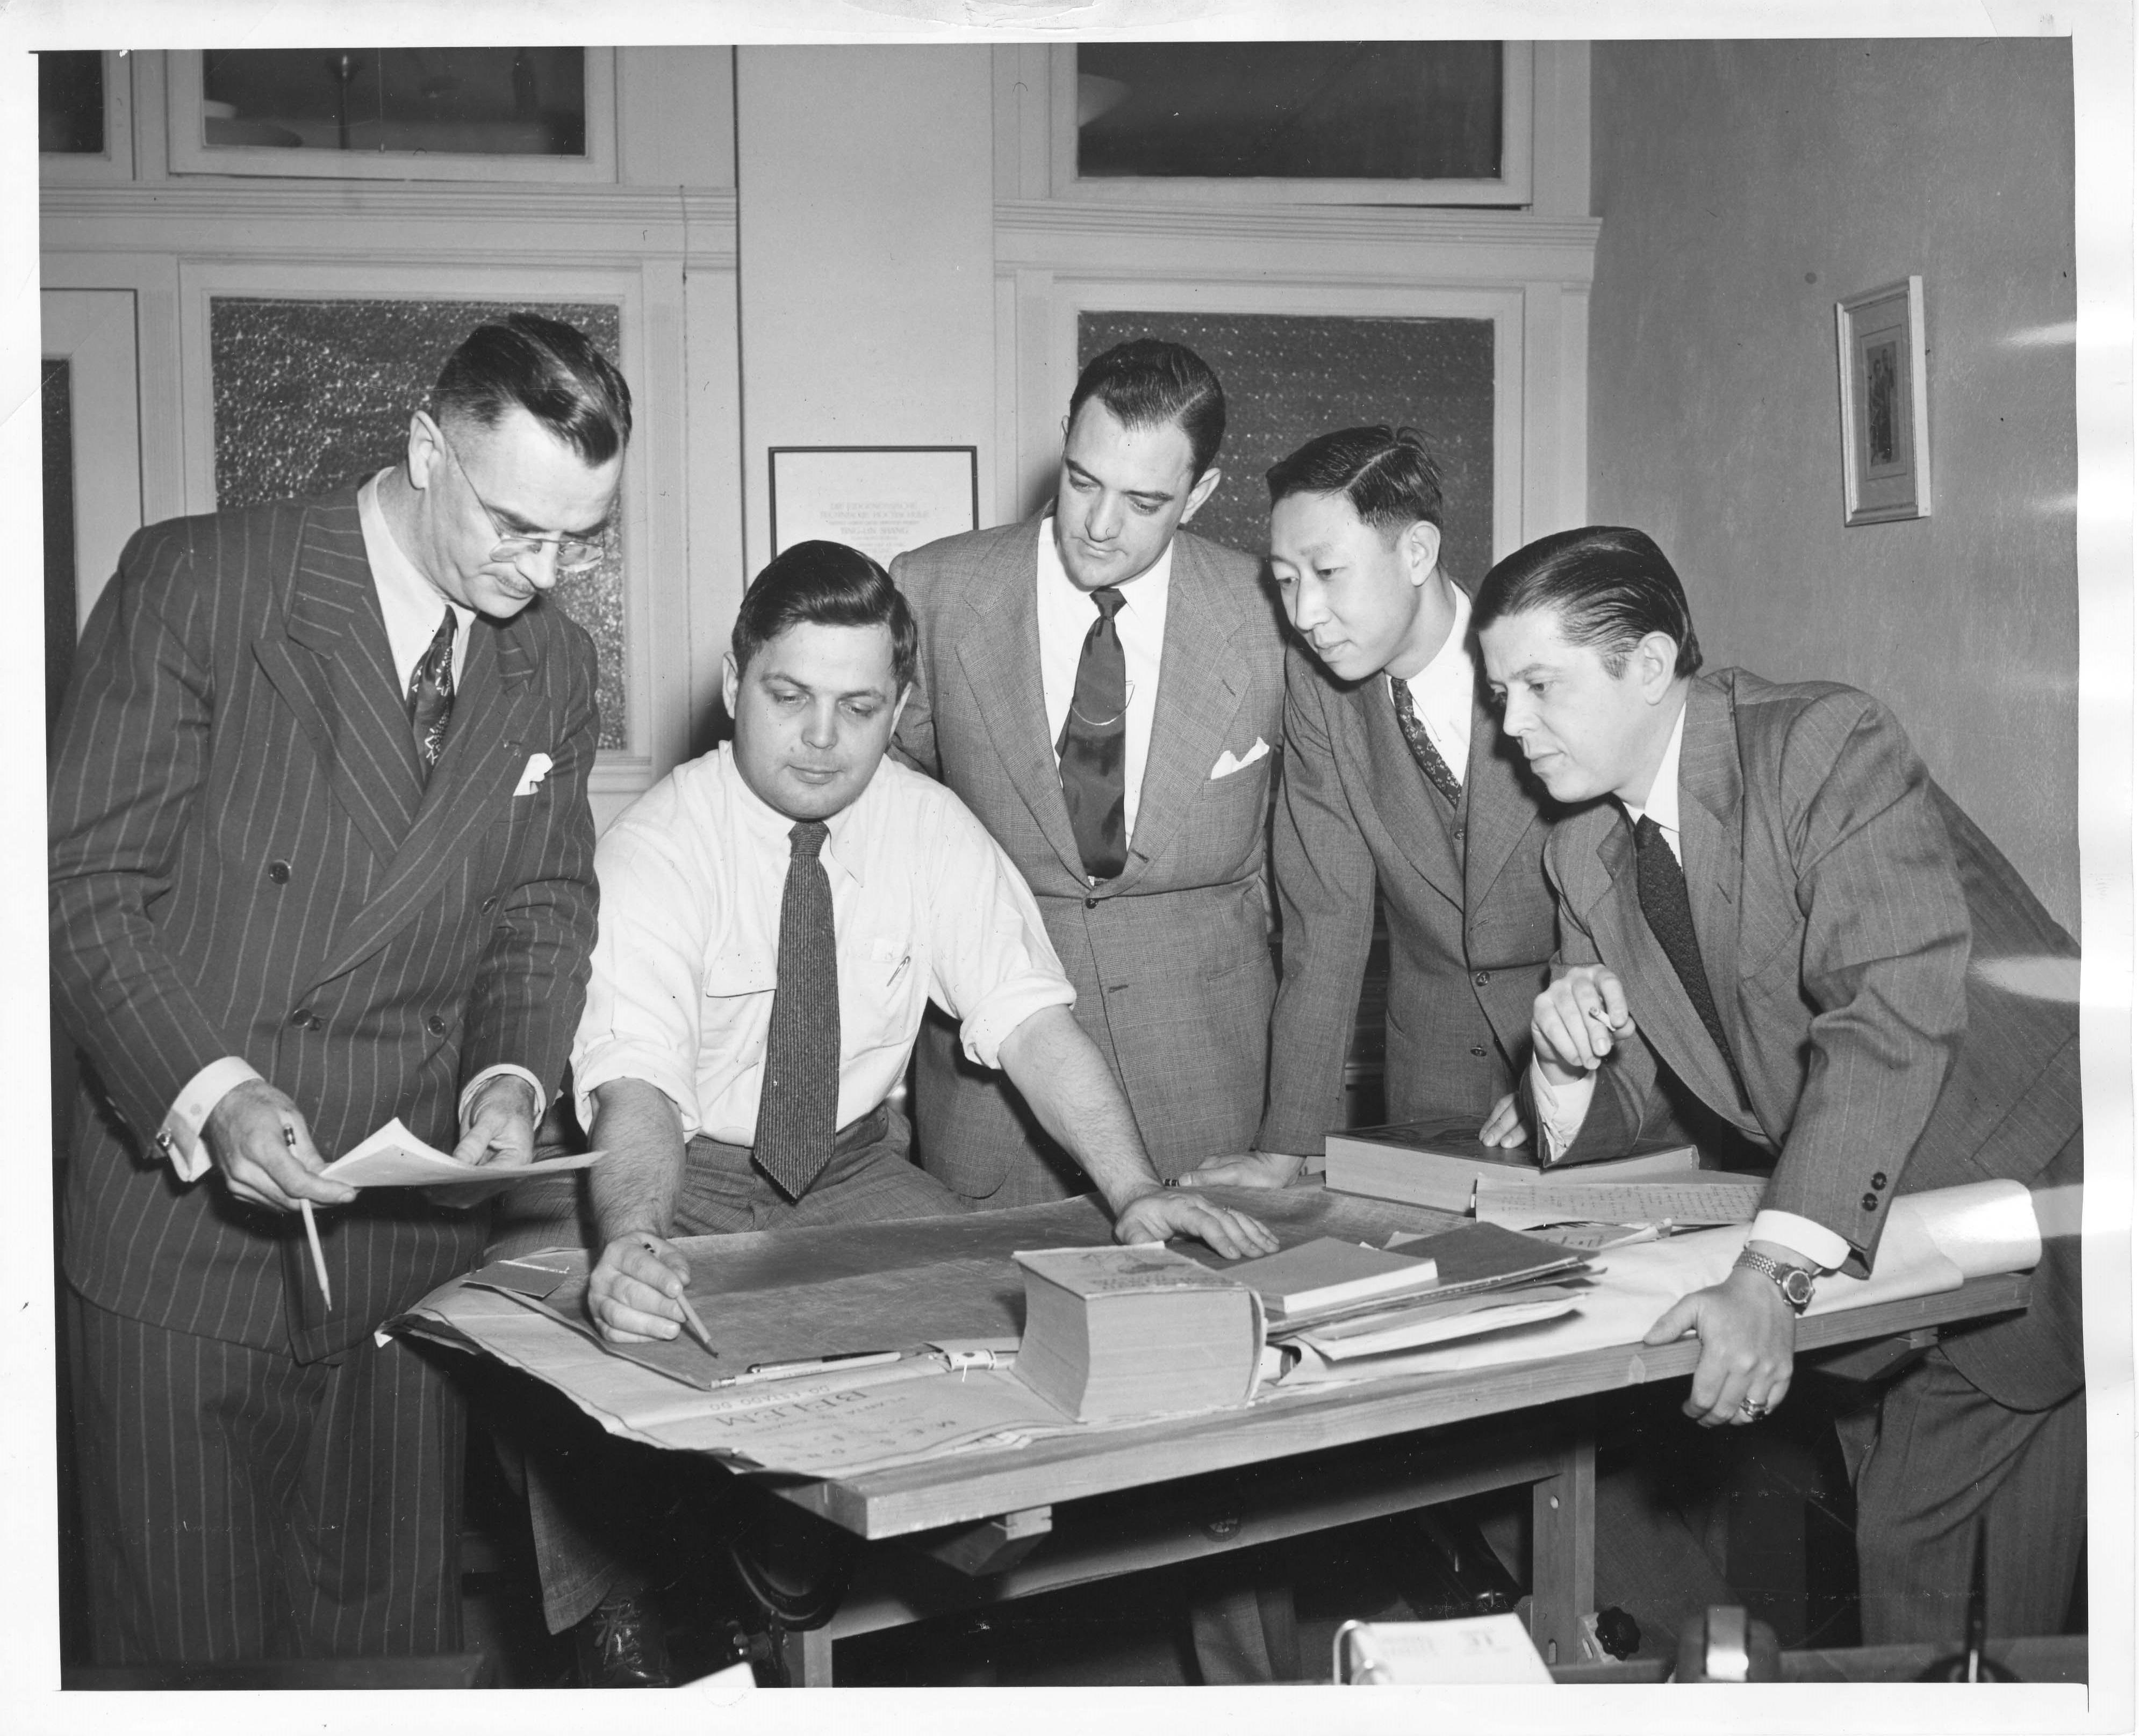 George Gunn, John Foster, George Jimenez, T. L. Shang, Victor de Mattos Cardoso